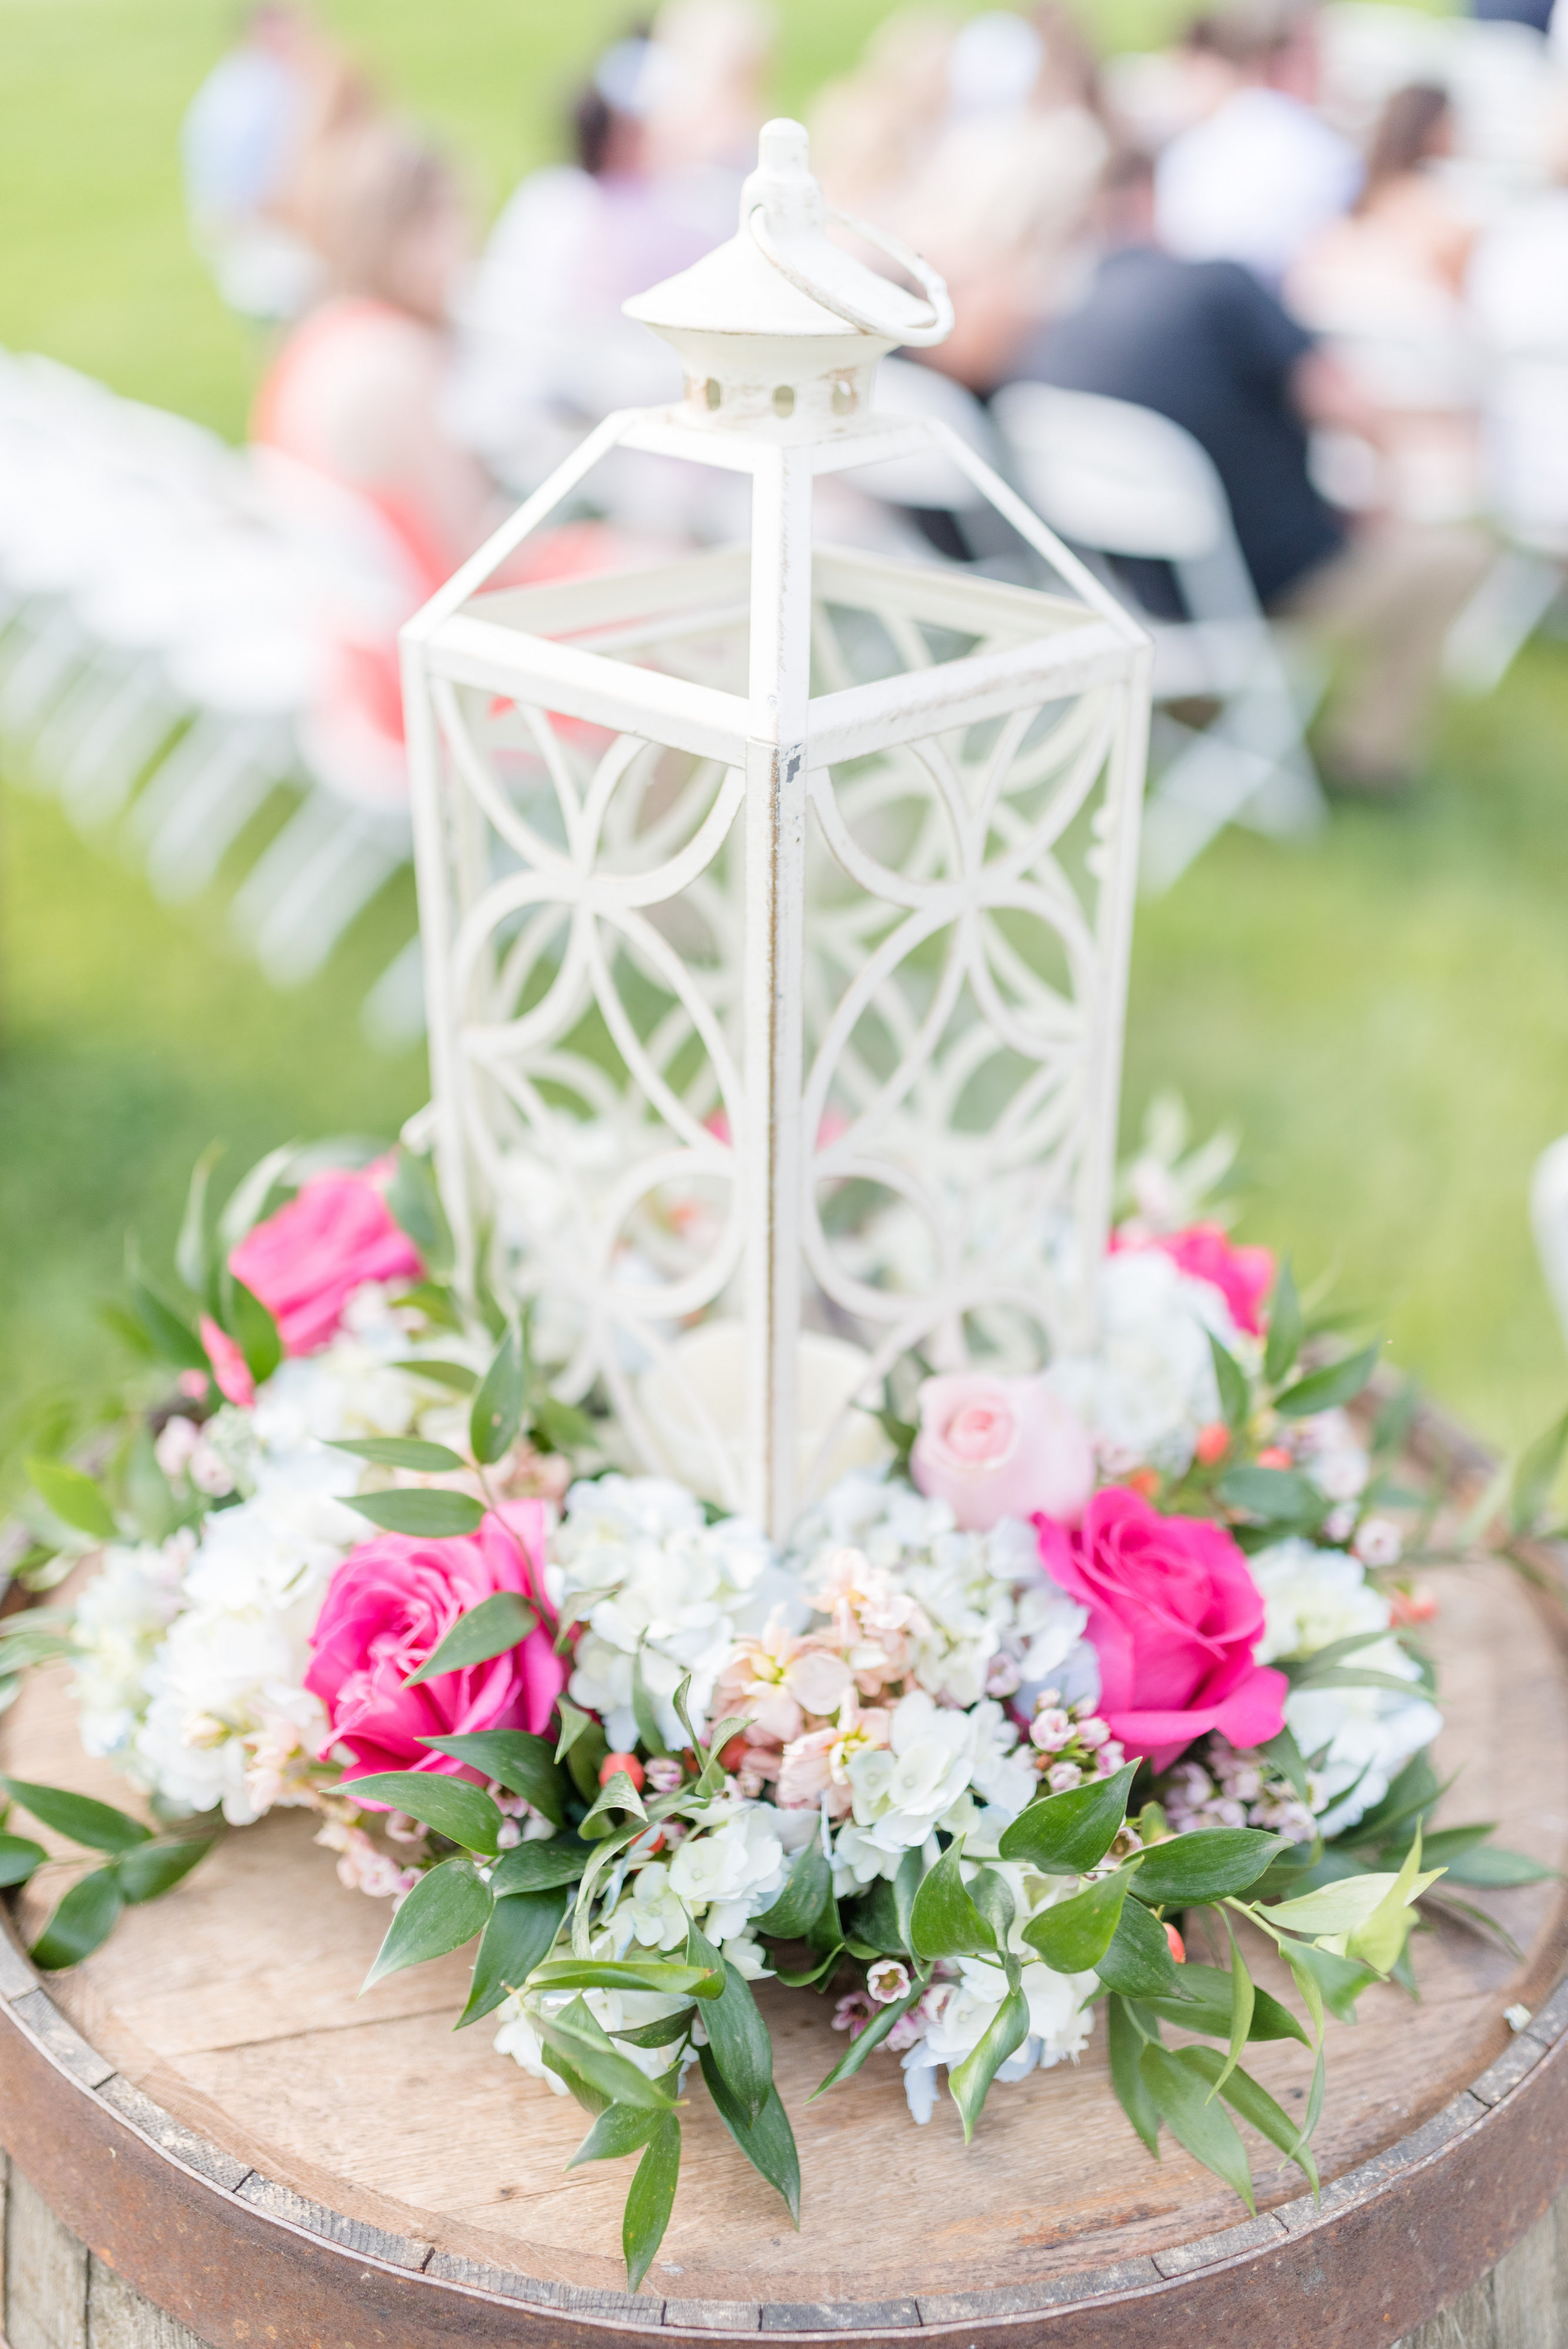 Keela and Blakes Wedding-Ceremony-0021